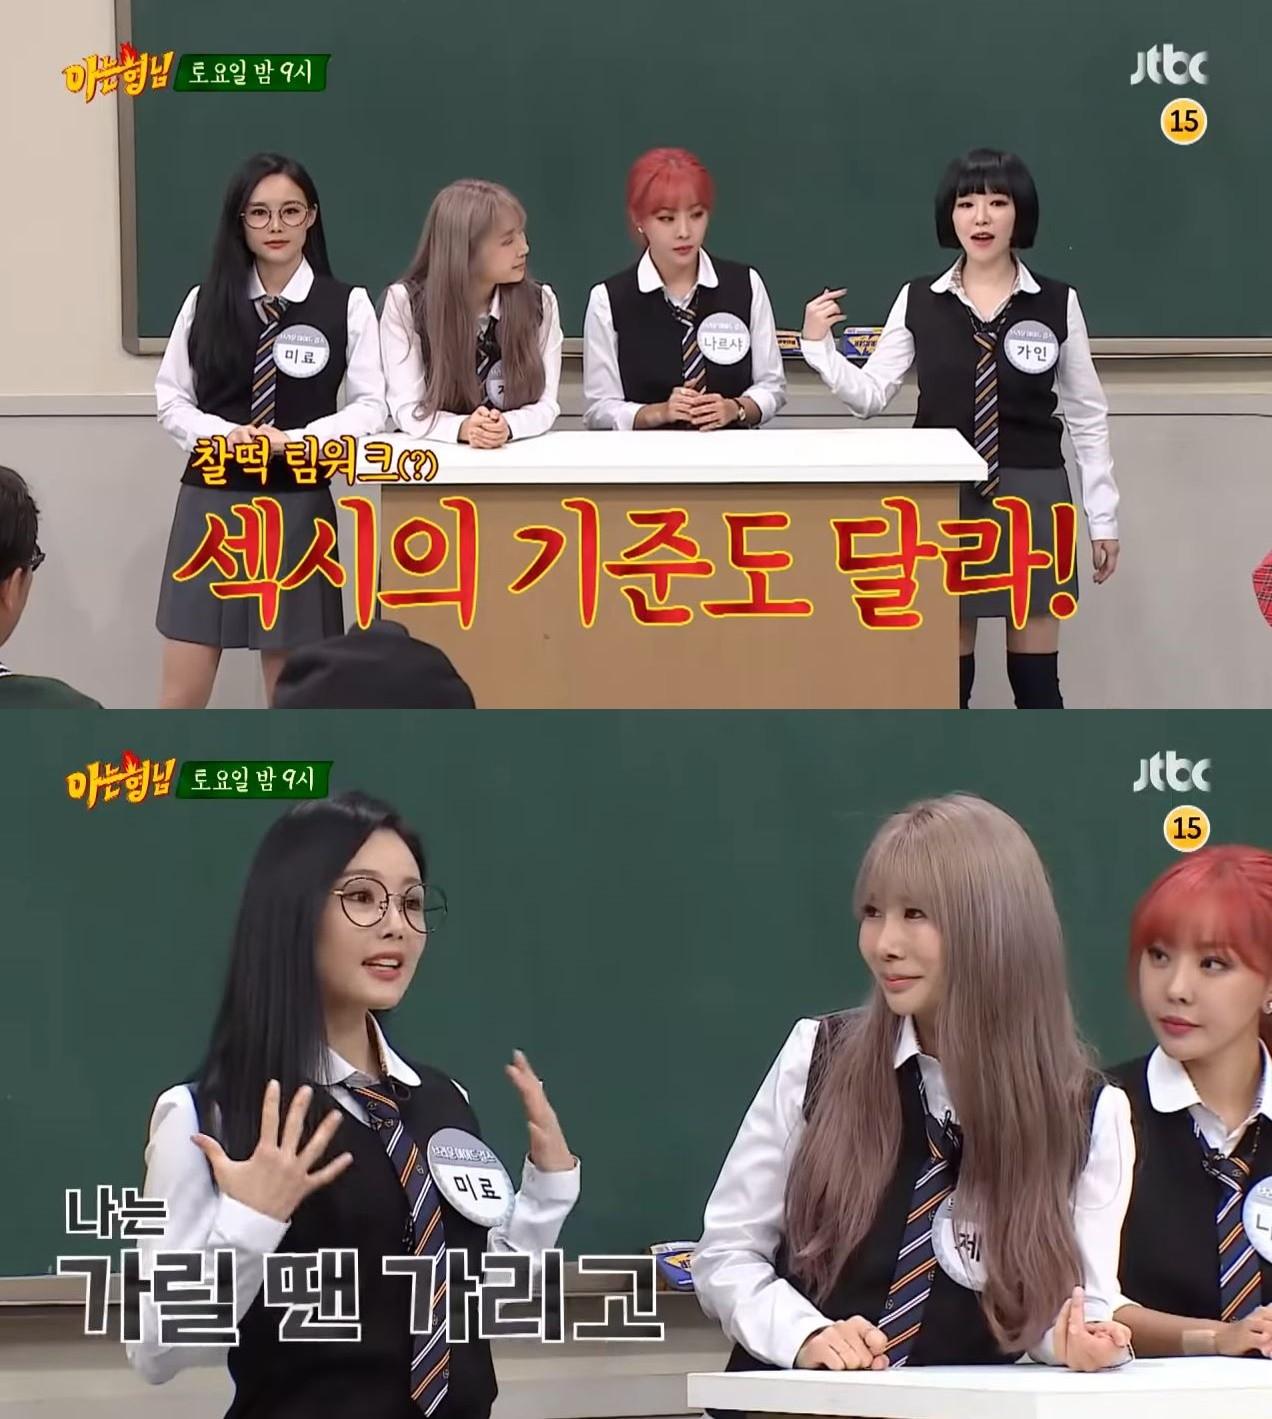 ▲Brown Eyed Girls「Miryo」37歲穿校服美炸!驚人外貌衝上熱搜。(圖/翻攝自JTBC)